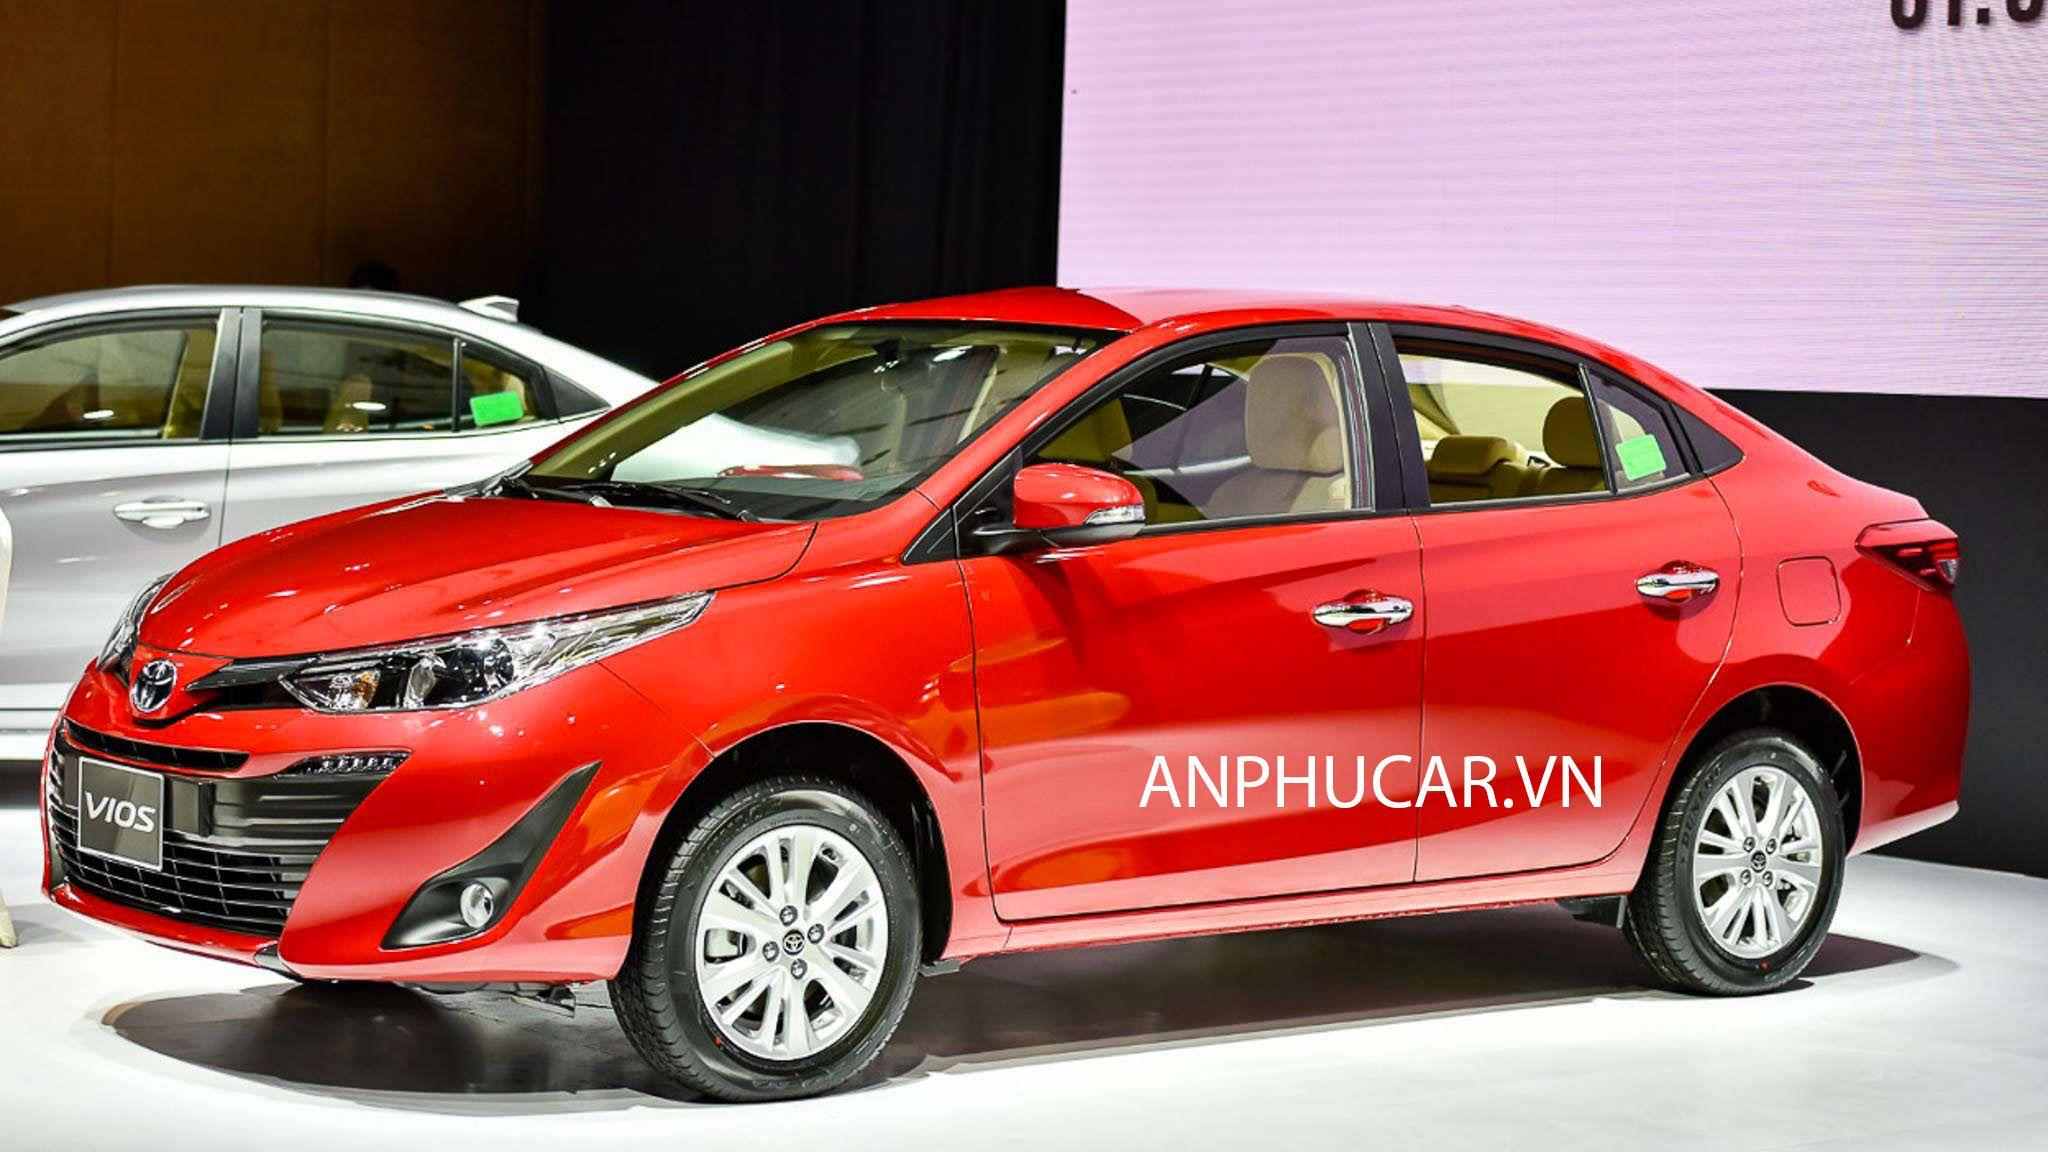 Toyota Vios 2020 Photo in 2020 Toyota vios, Toyota, New cars